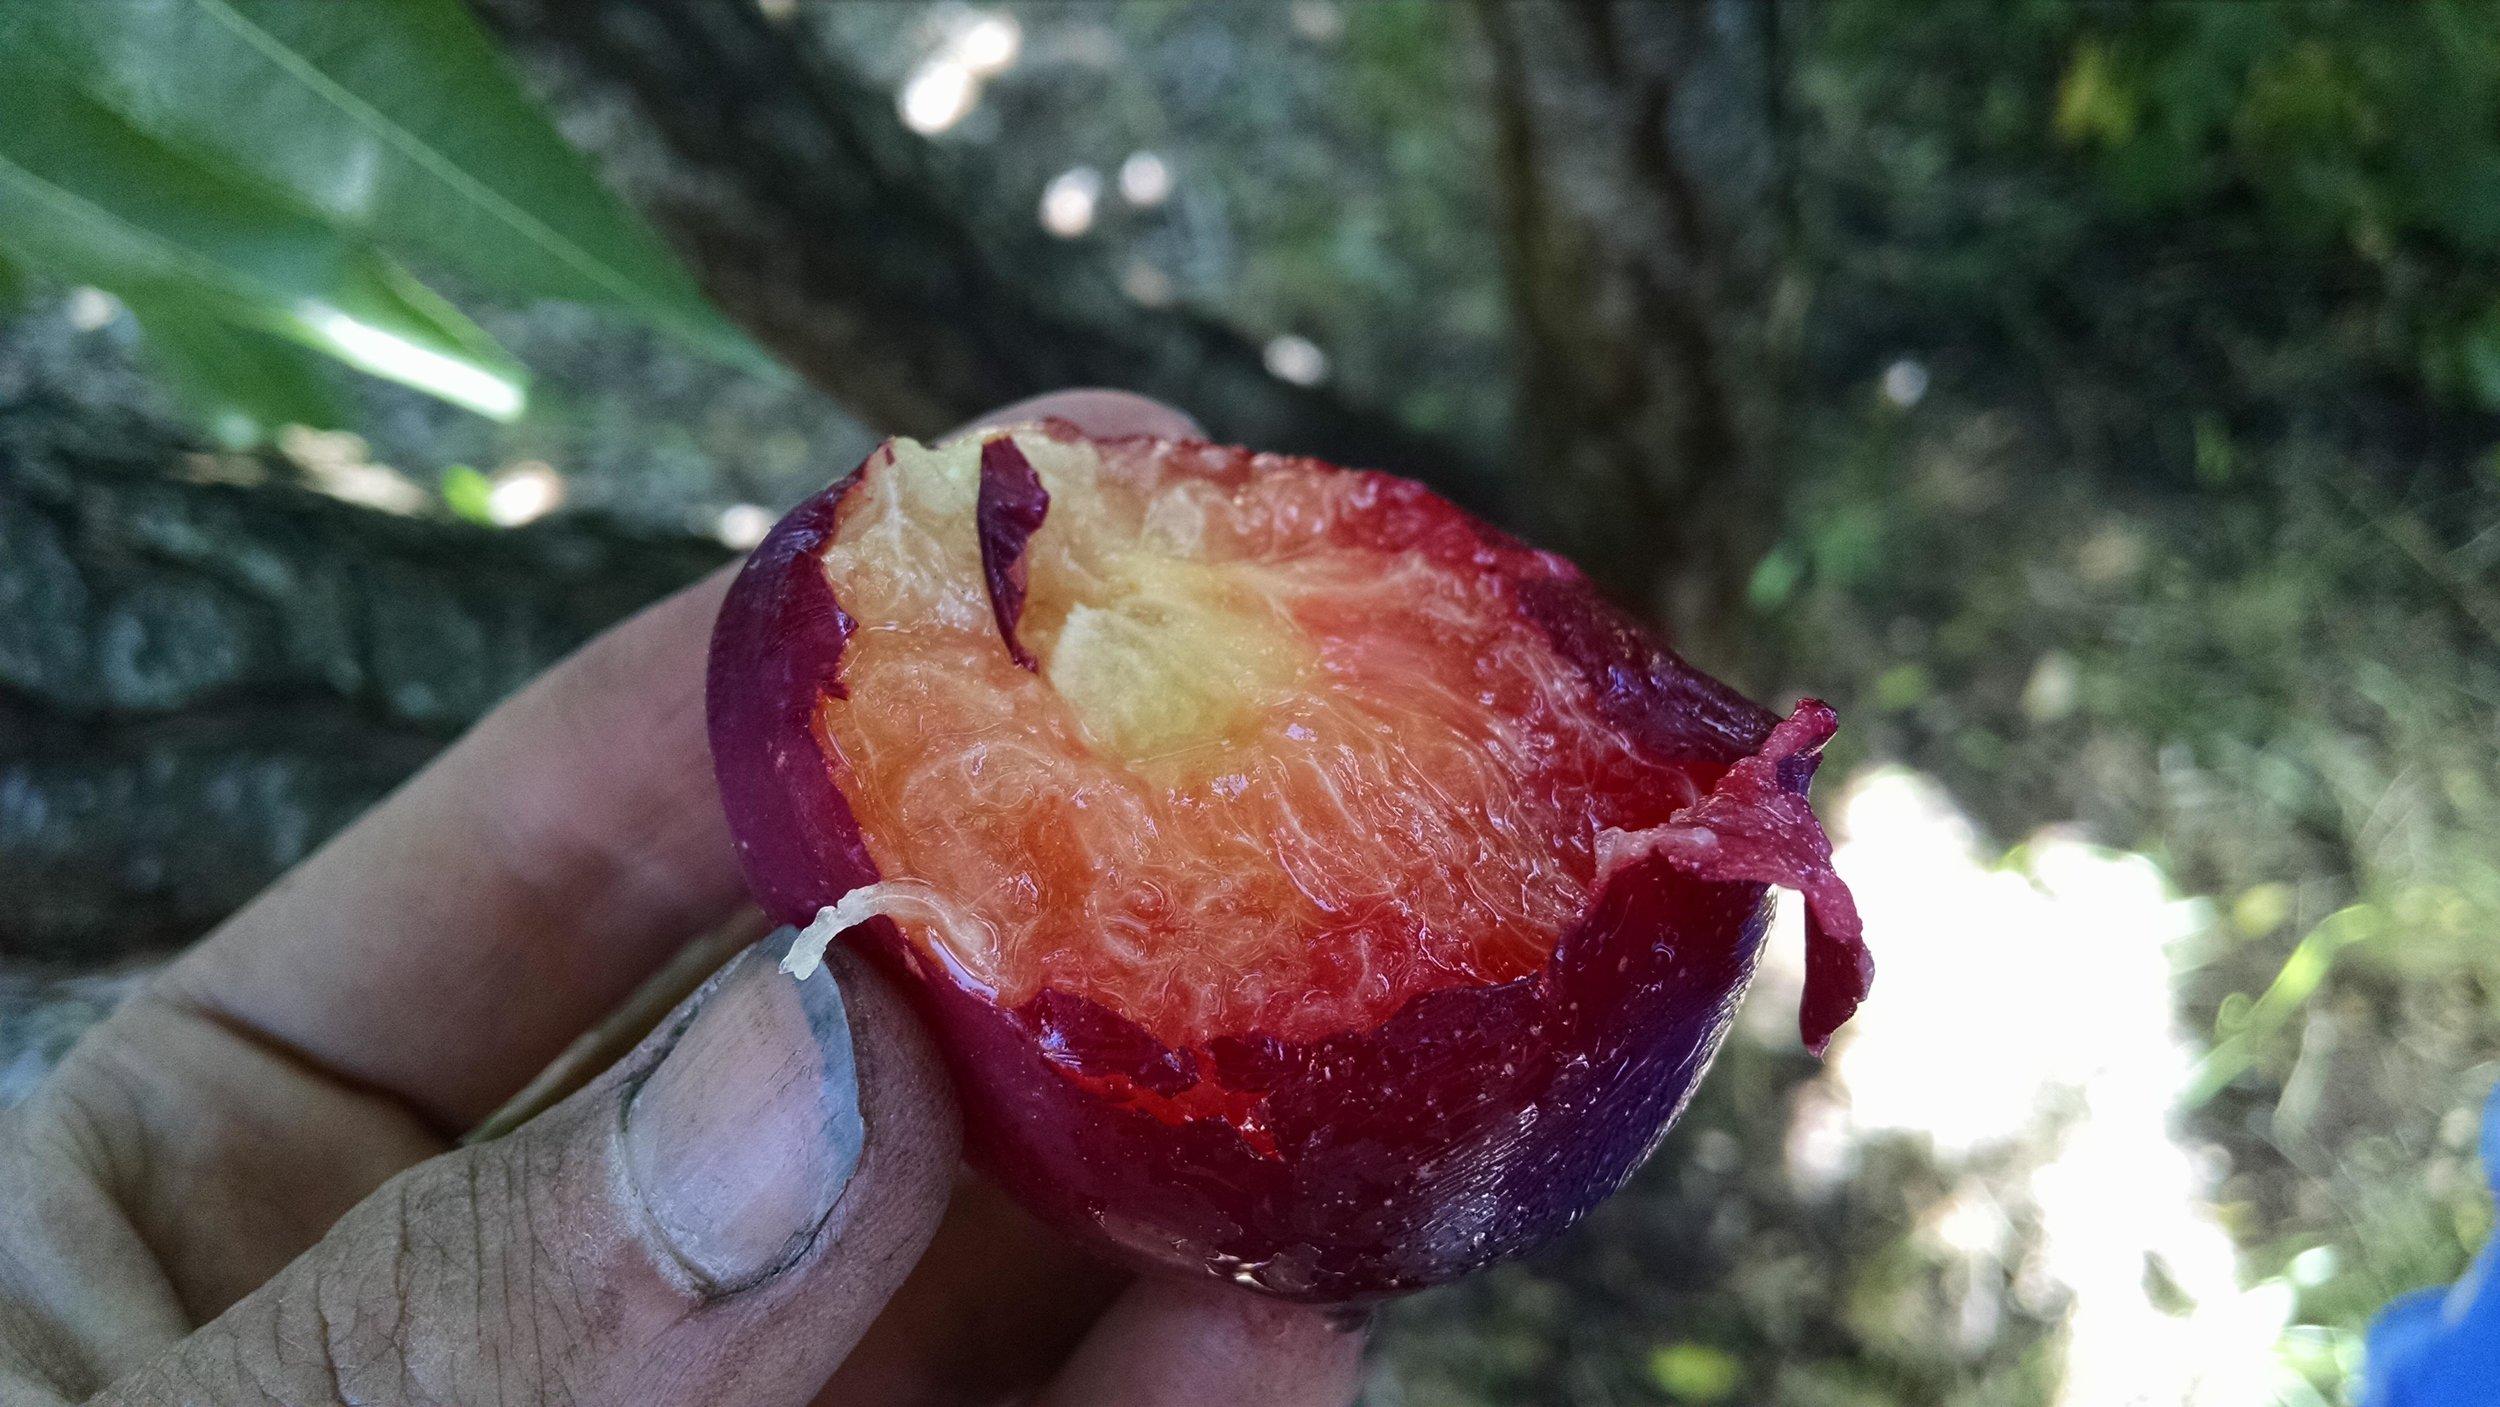 Glorious plum